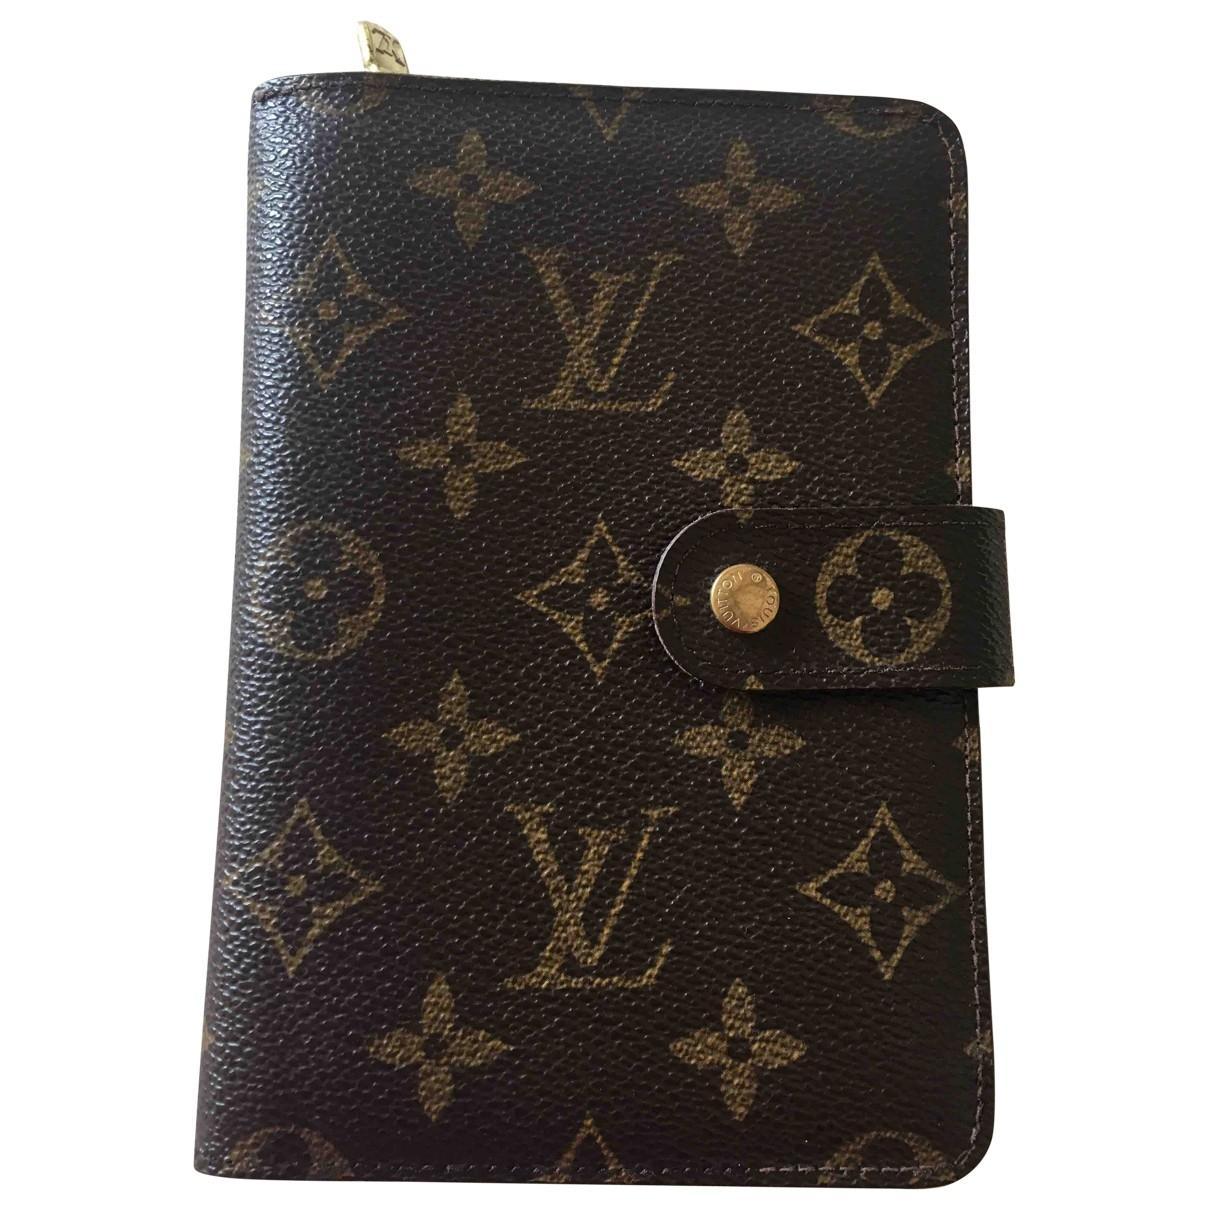 Agenda de Lona Louis Vuitton